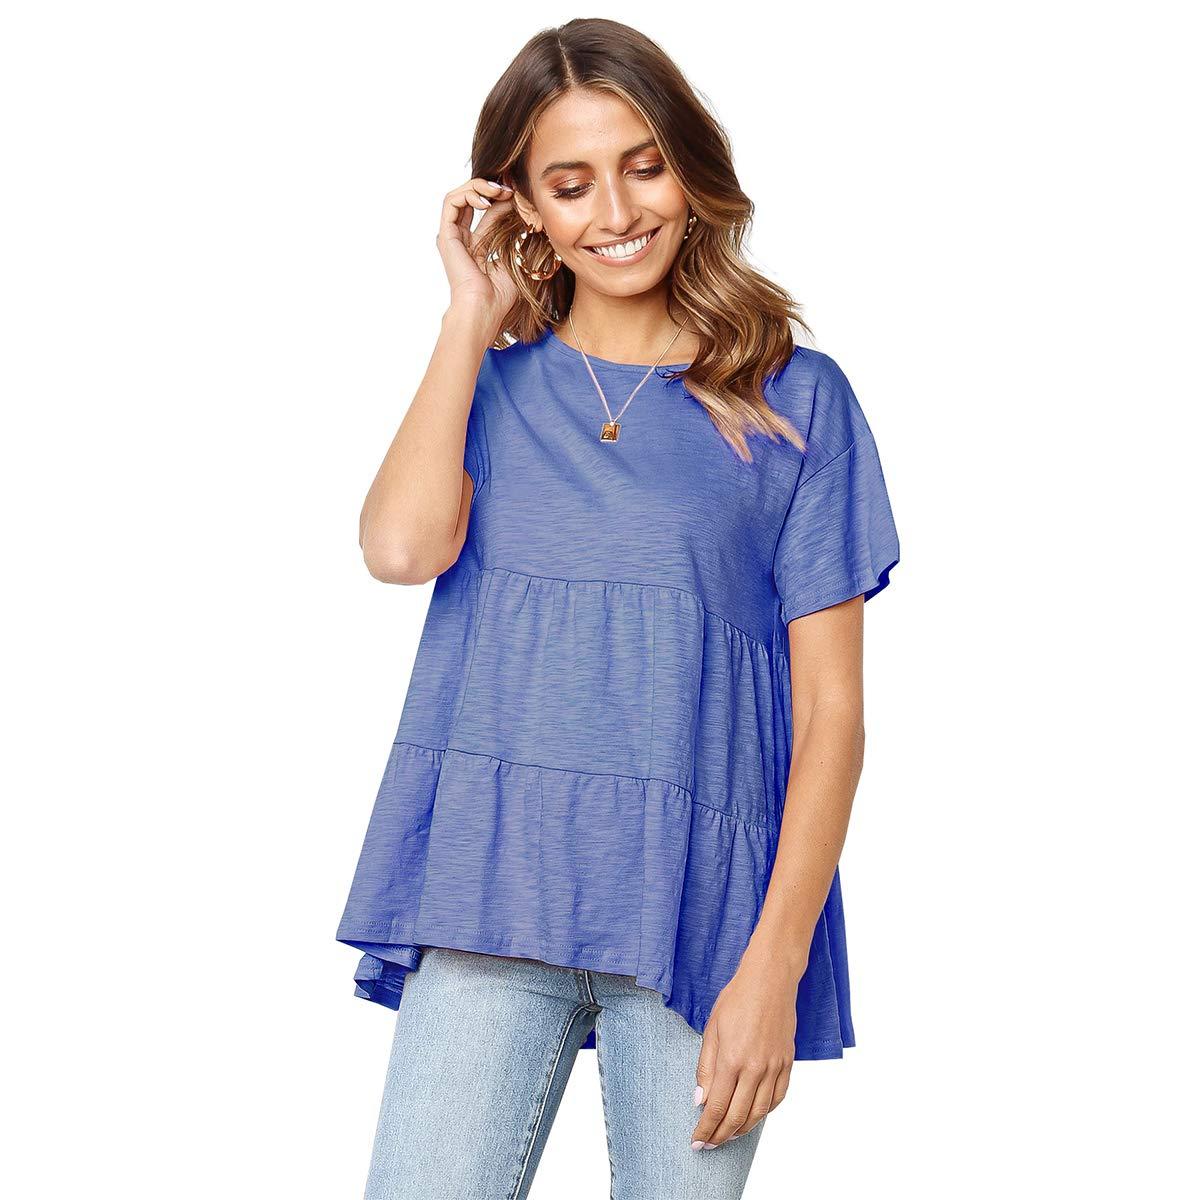 bluee OEUVRE Women's Short Sleeve Contrast Black color Trim Plain Tshirts